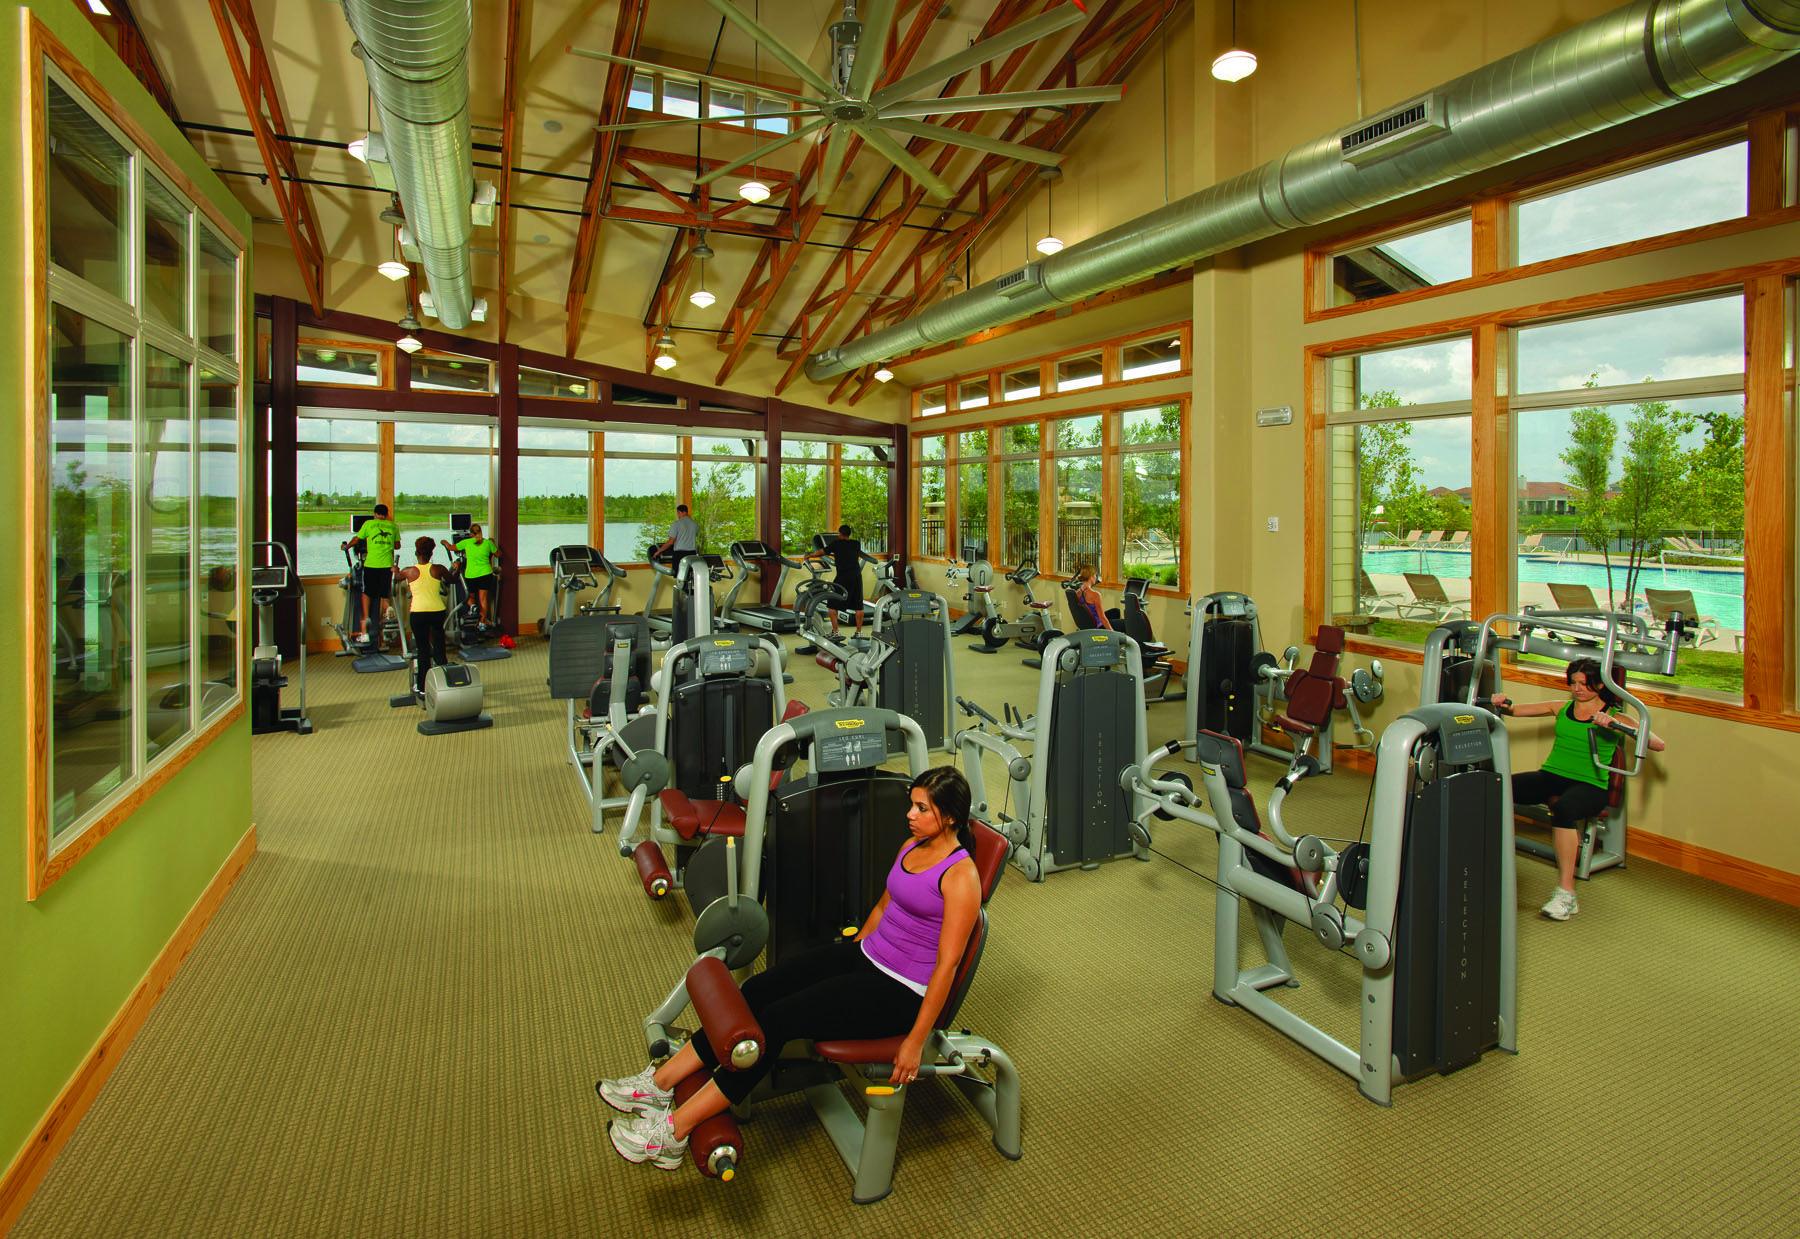 Fitness Center in Cross Creek Ranch. Fulshear, Taylor